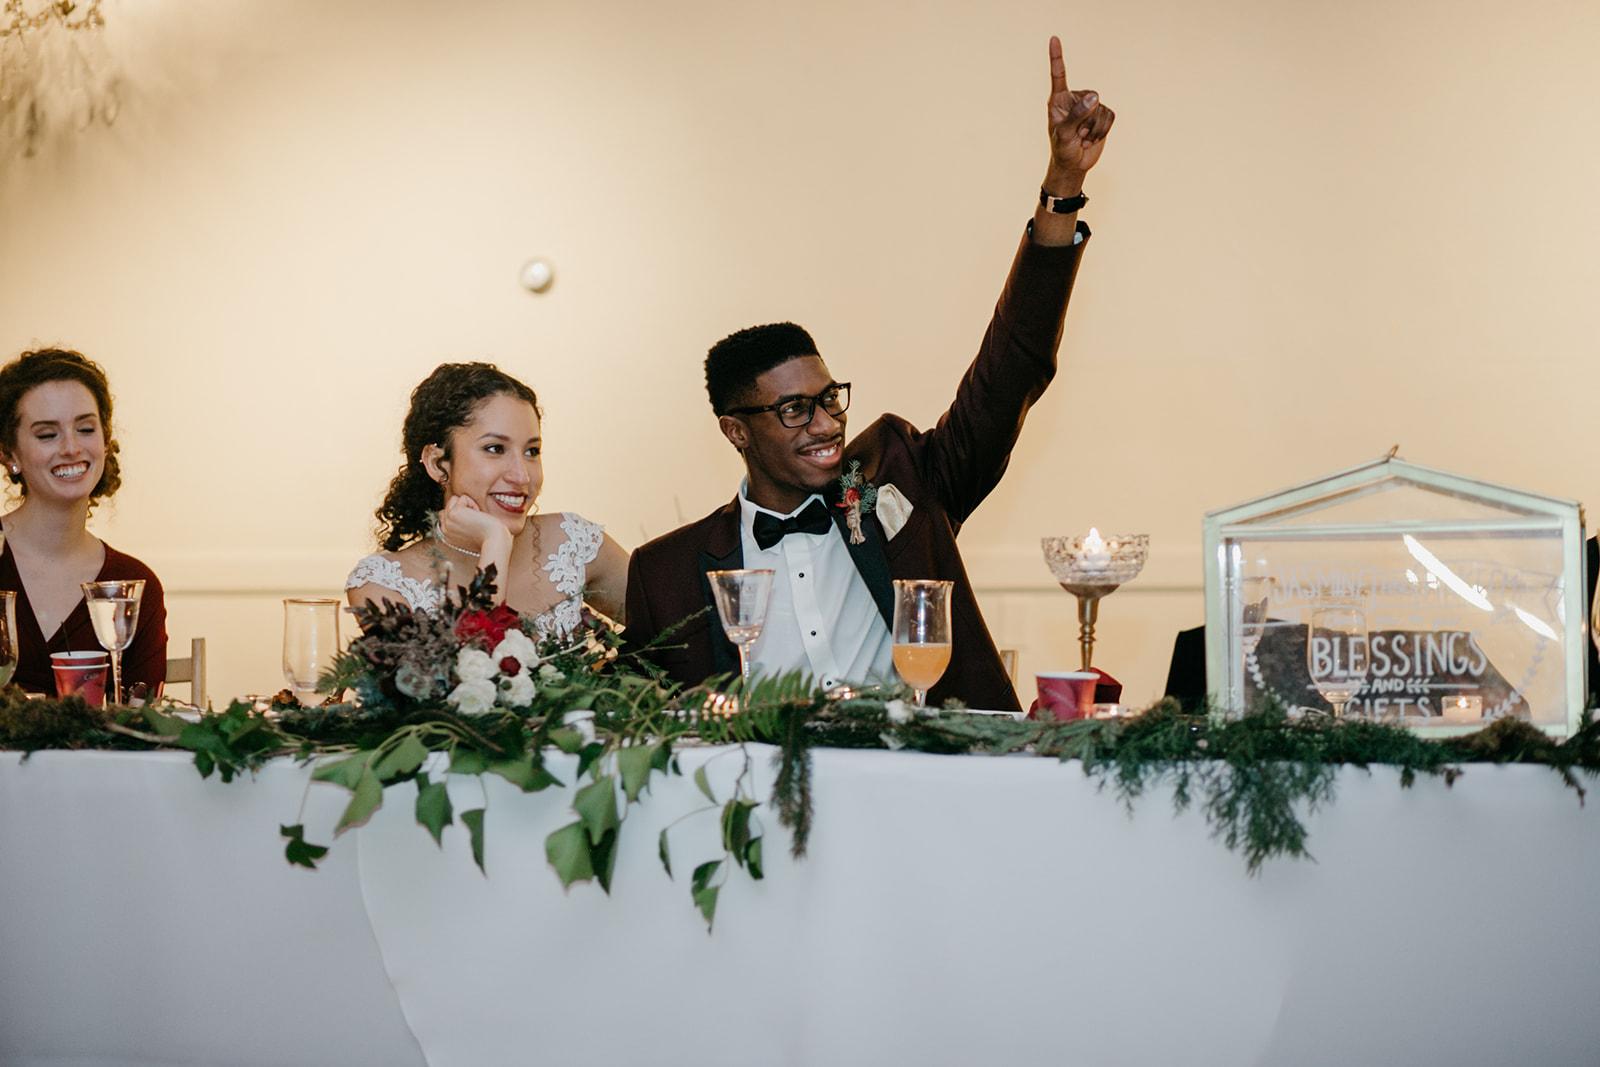 portland - wedding - photographer - doorofhopechurch657.jpg